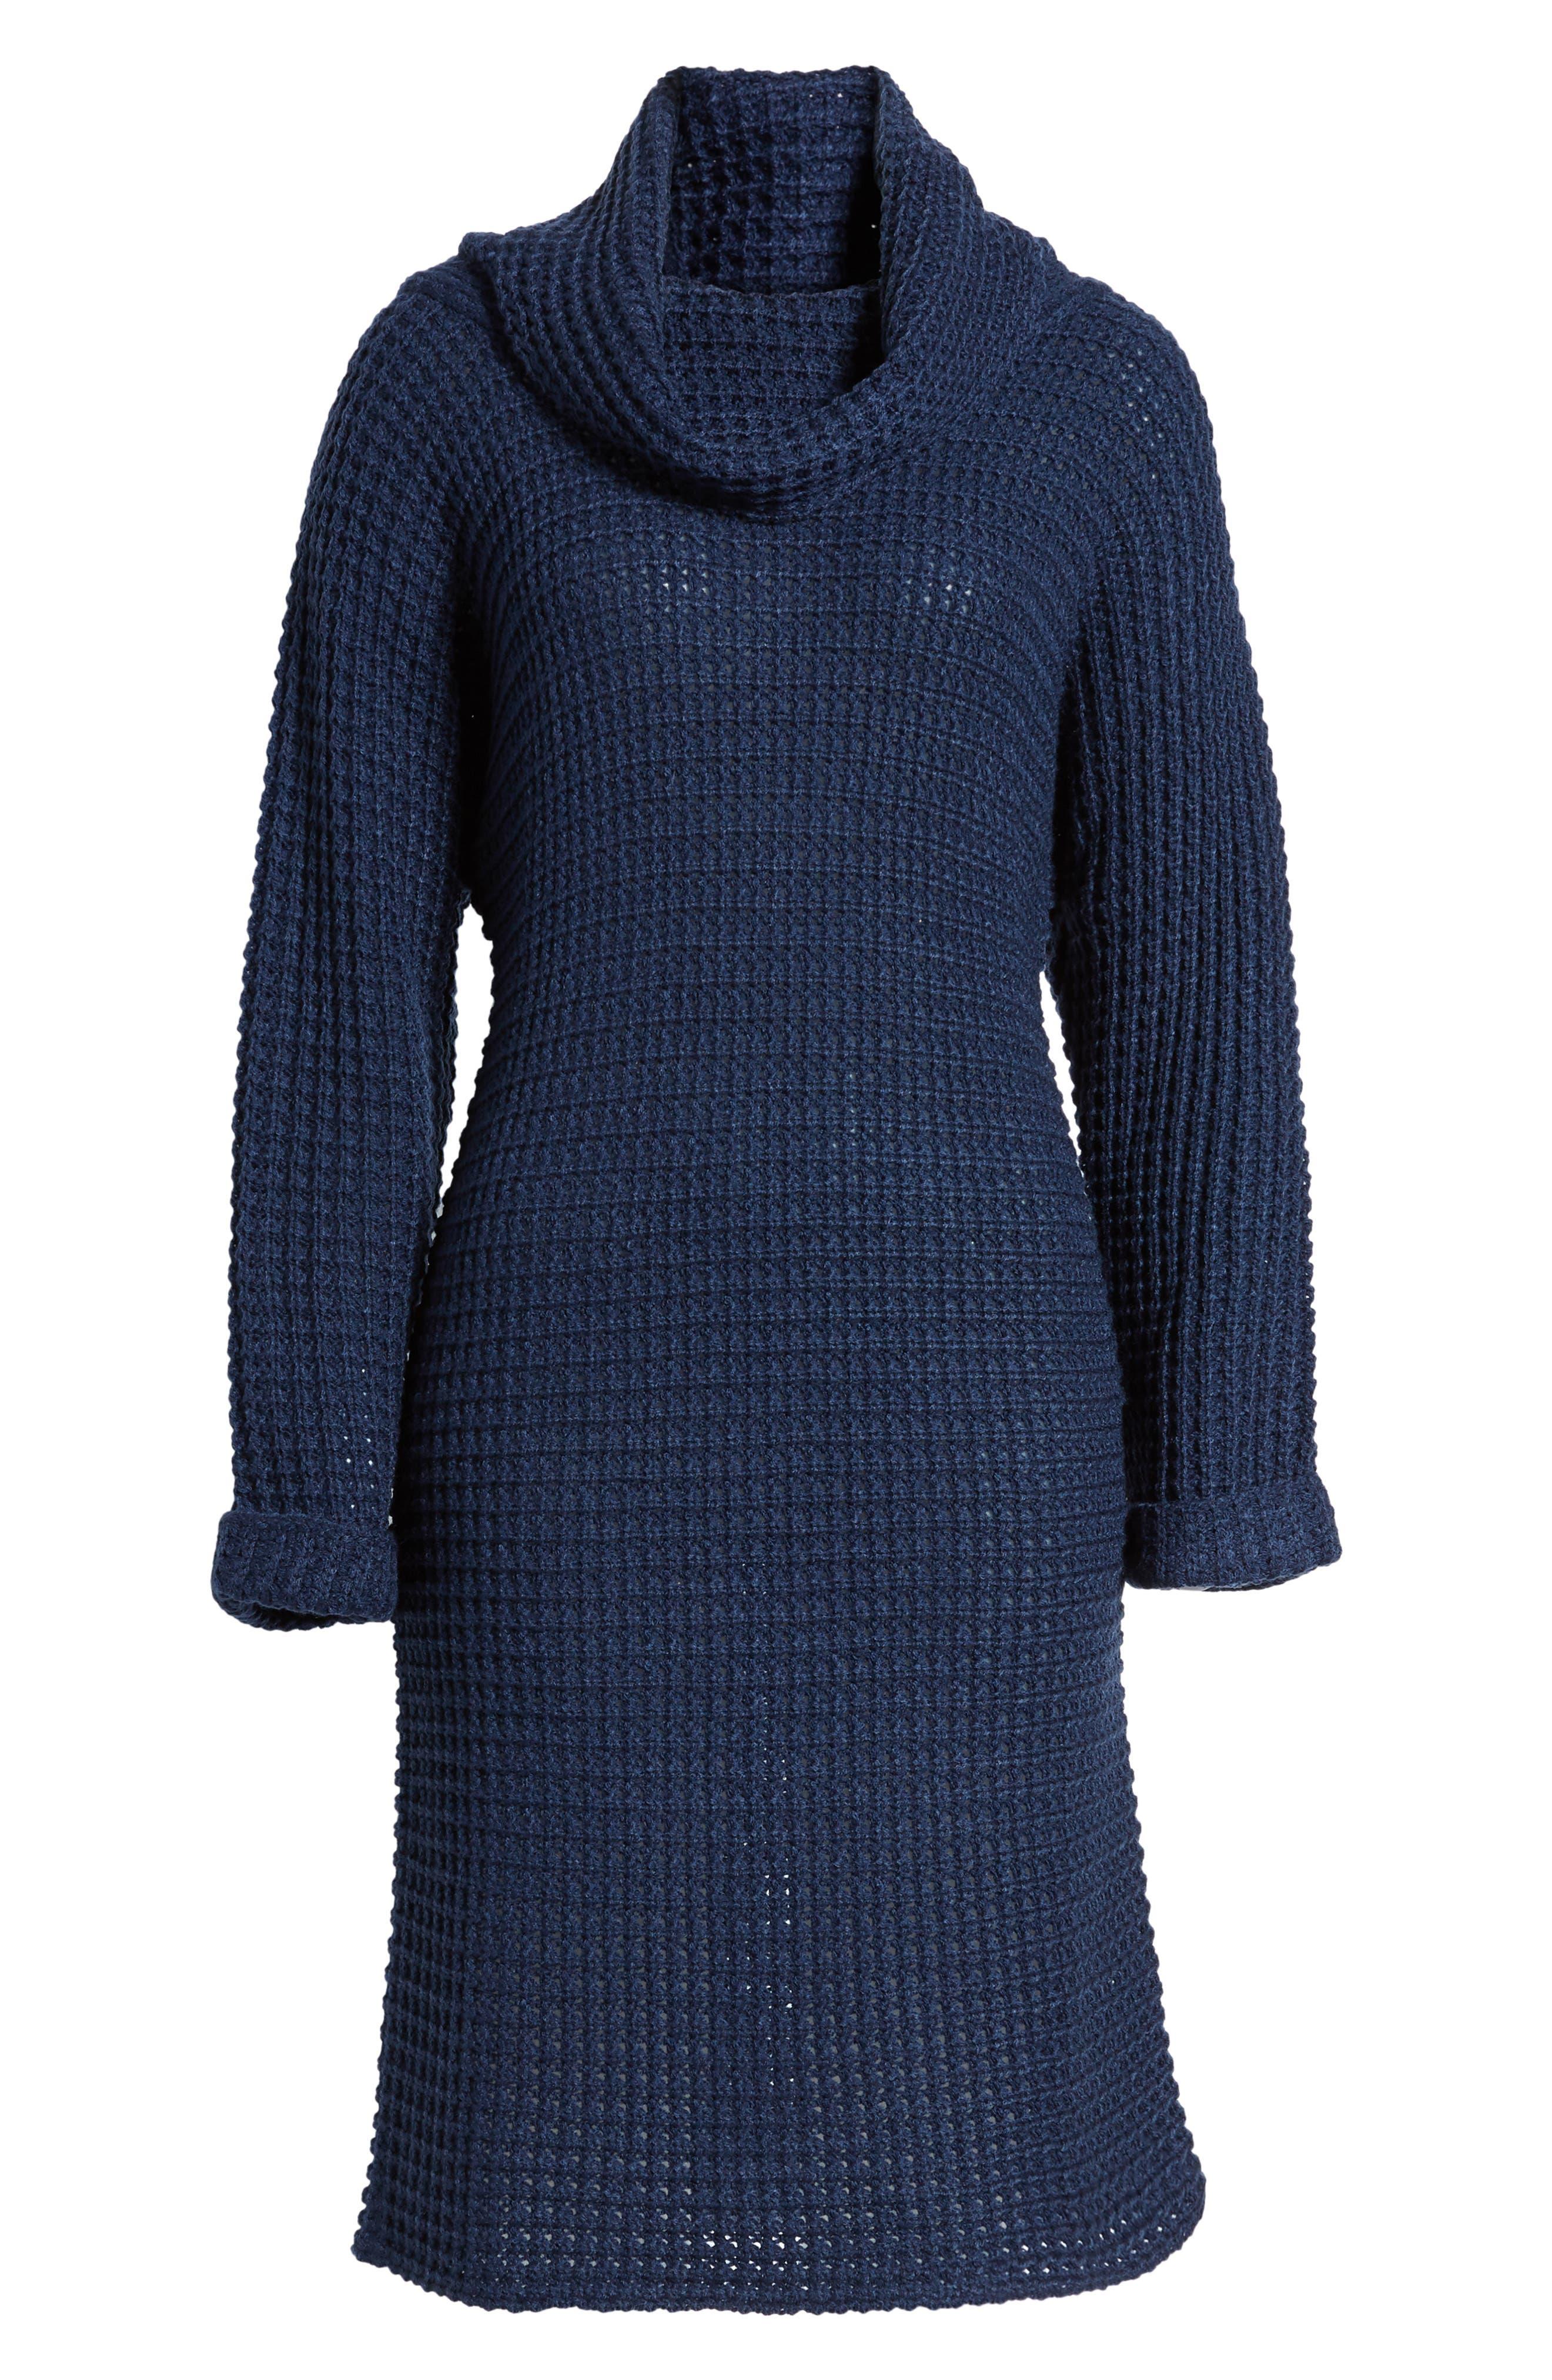 Turtleneck Sweater Dress,                             Alternate thumbnail 6, color,                             Navy